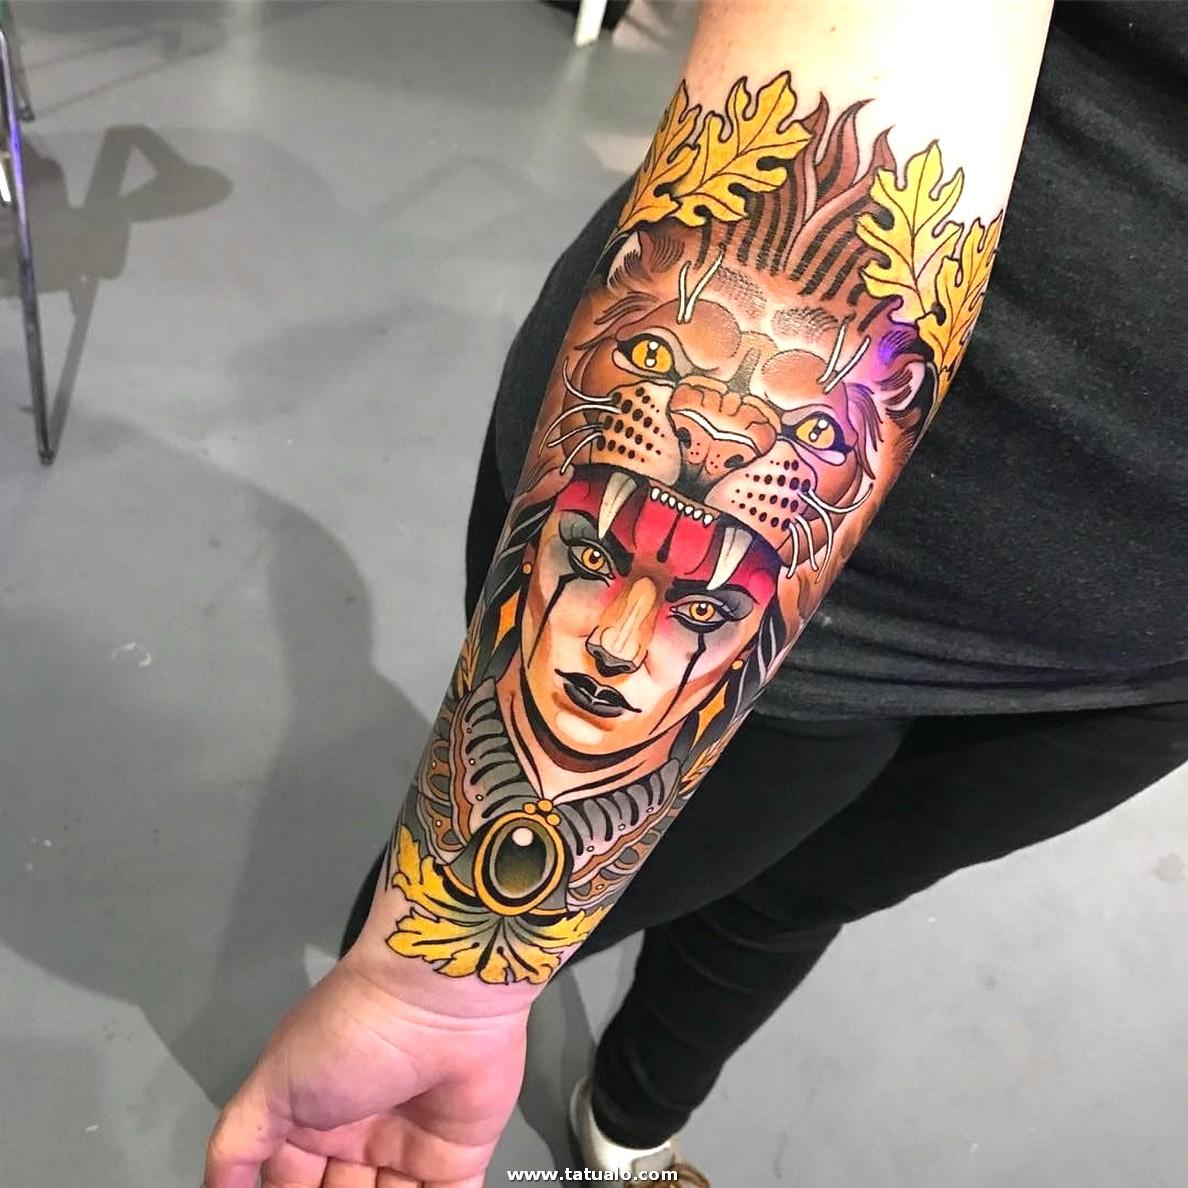 Tatuajes Para Mujeres En El Brazo 23dqwe